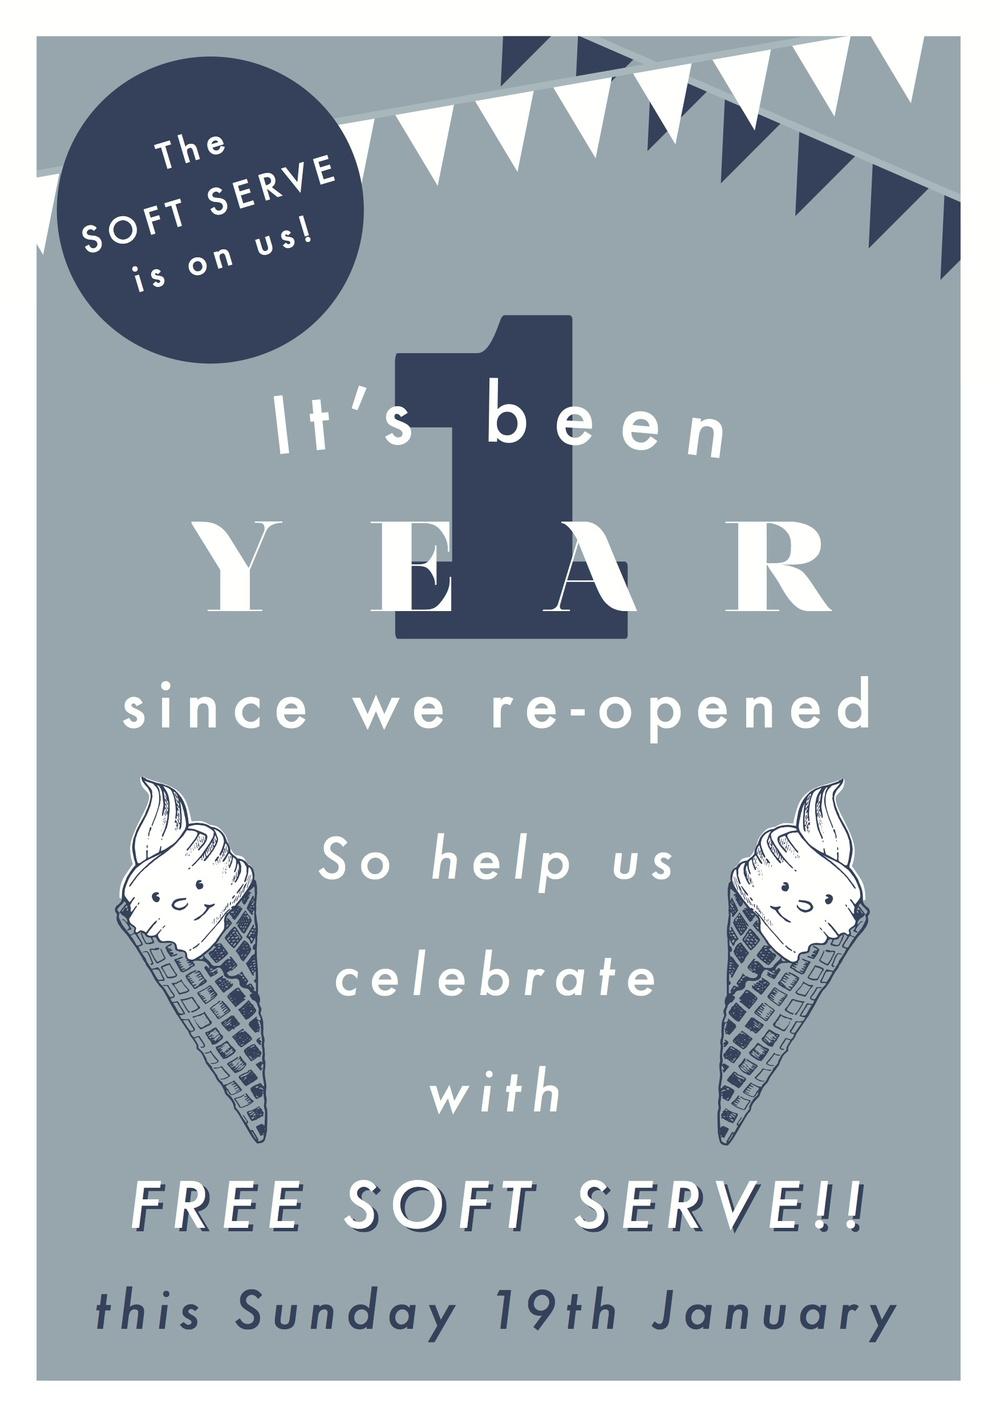 free soft serve (1).jpg